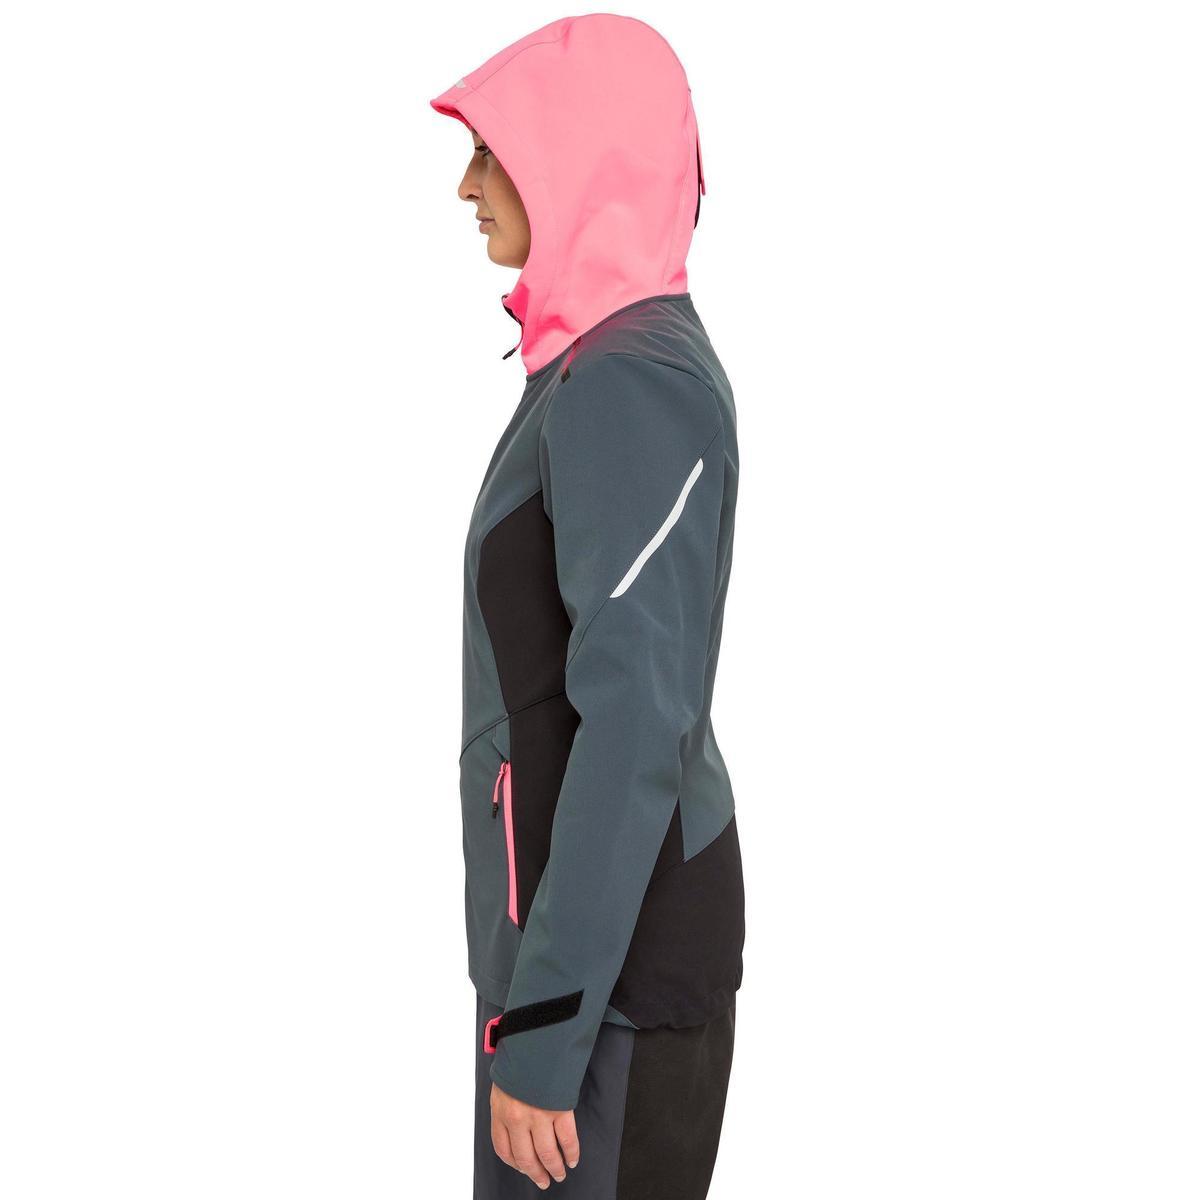 Bild 4 von Softshelljacke Segeln Race Damen grau/neonrosa